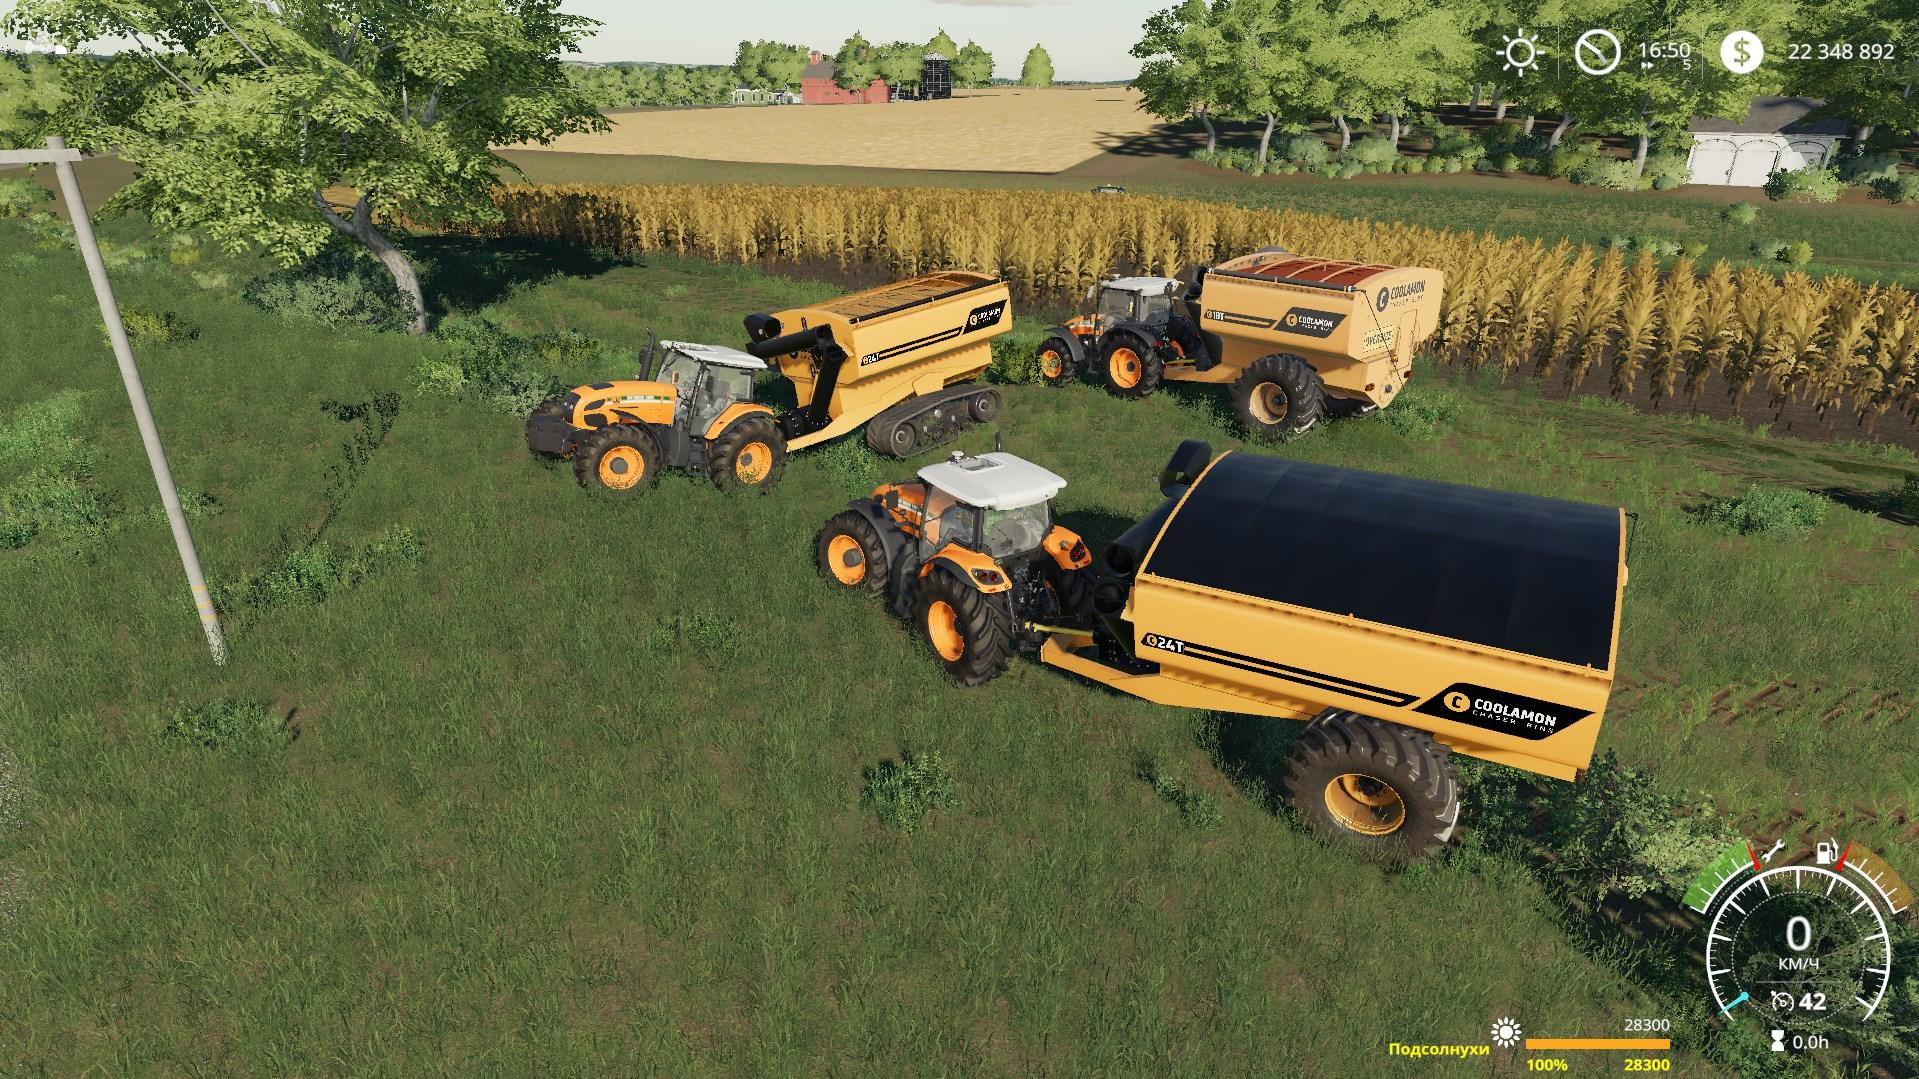 COOLAMON CHASER BINS 18T AND 24T V2.0.0.0 для Farming Simulator 2019